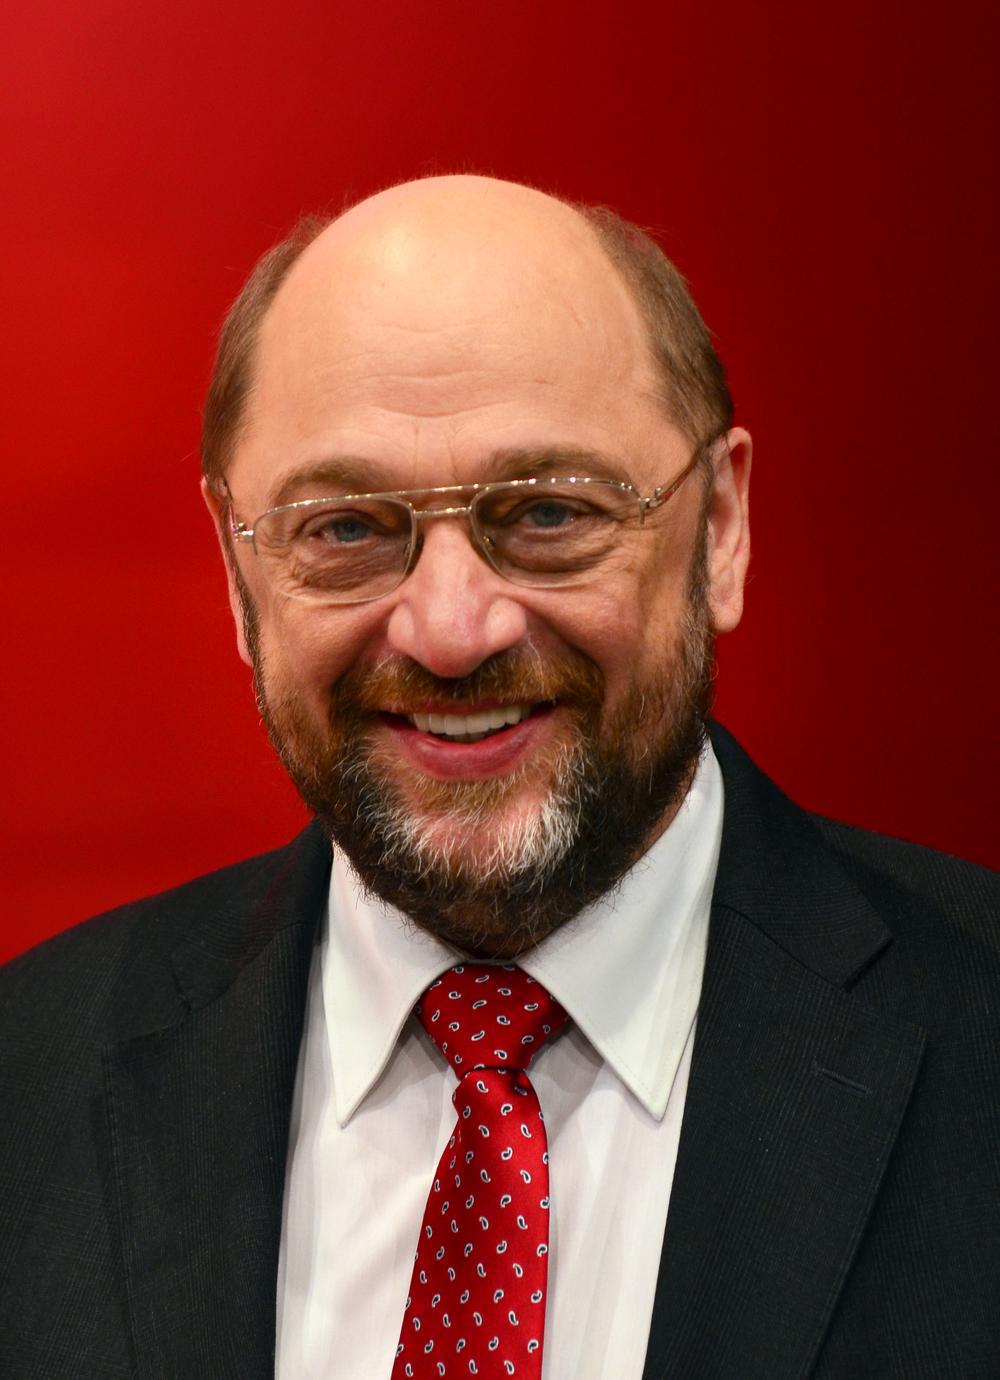 Martin Schulz. Credit:Moritz Kosinsky via Wikimedia Commons.